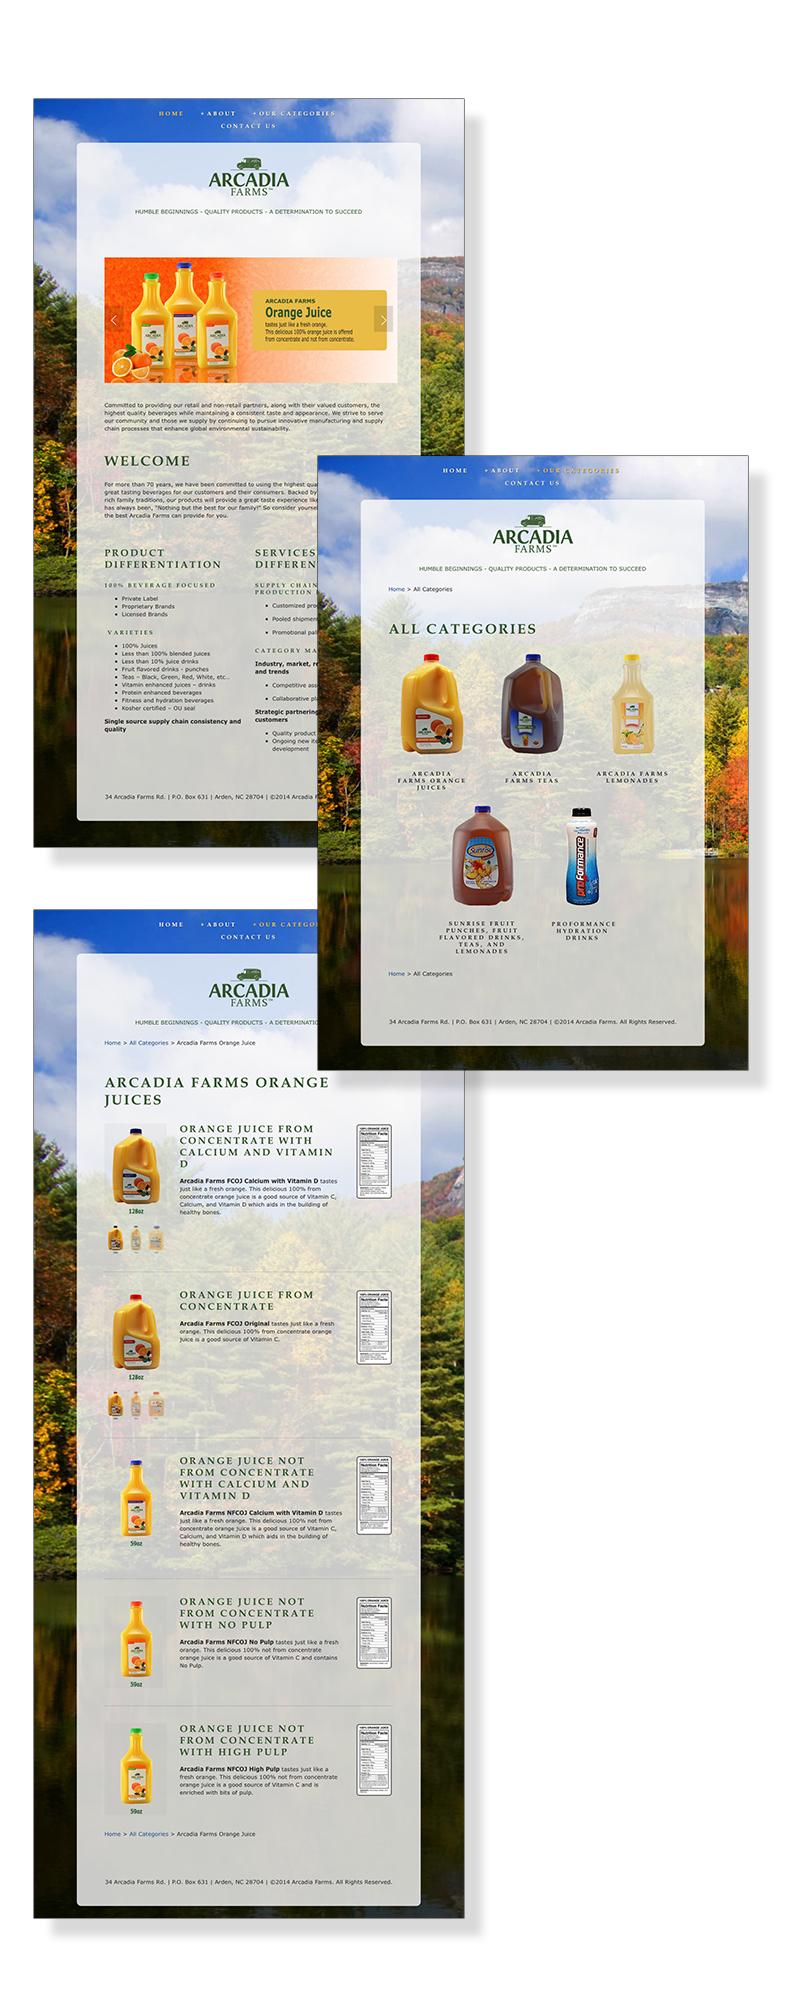 arcadia-farms-pages-tmoss-portfolio.jpg